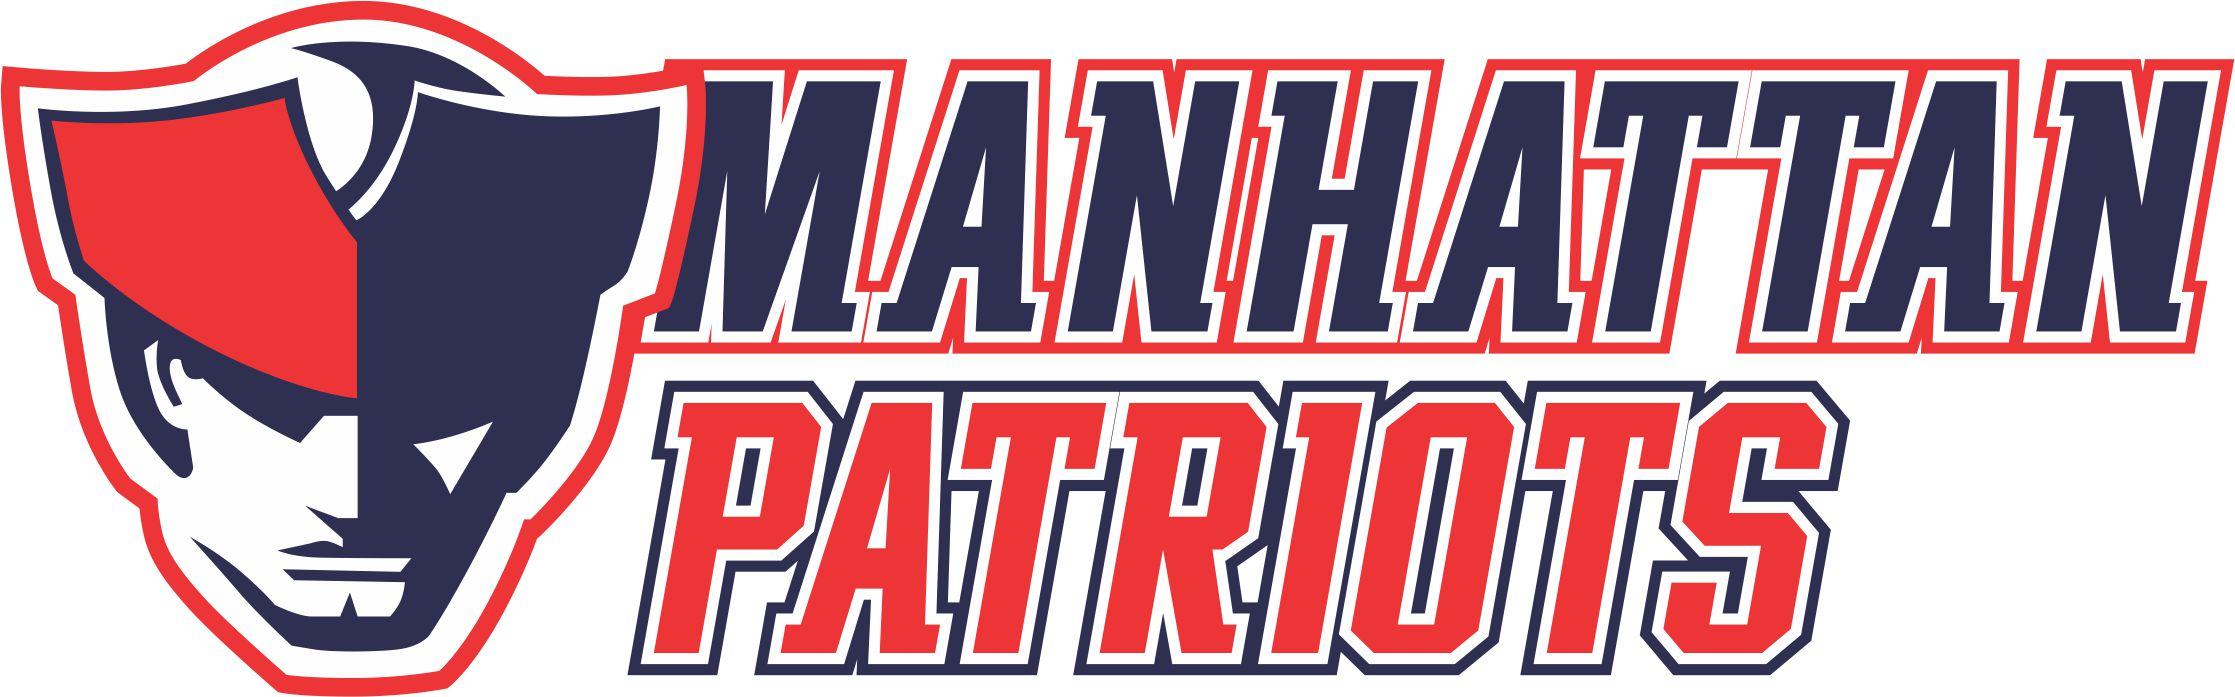 Manhattan Patriots, Football, Goal, Field